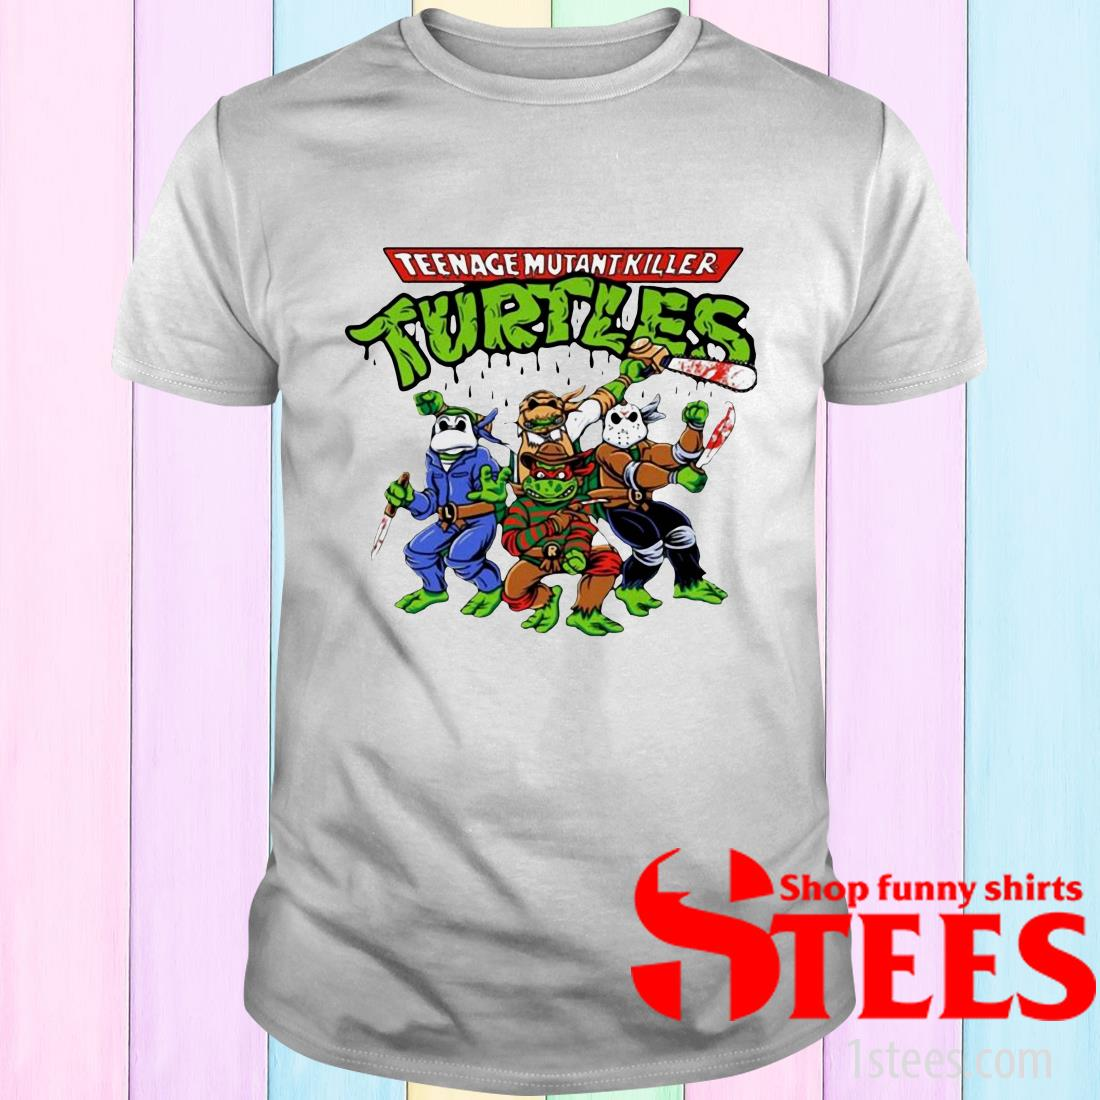 Teenage Mutant Killer Turtles T-Shirt